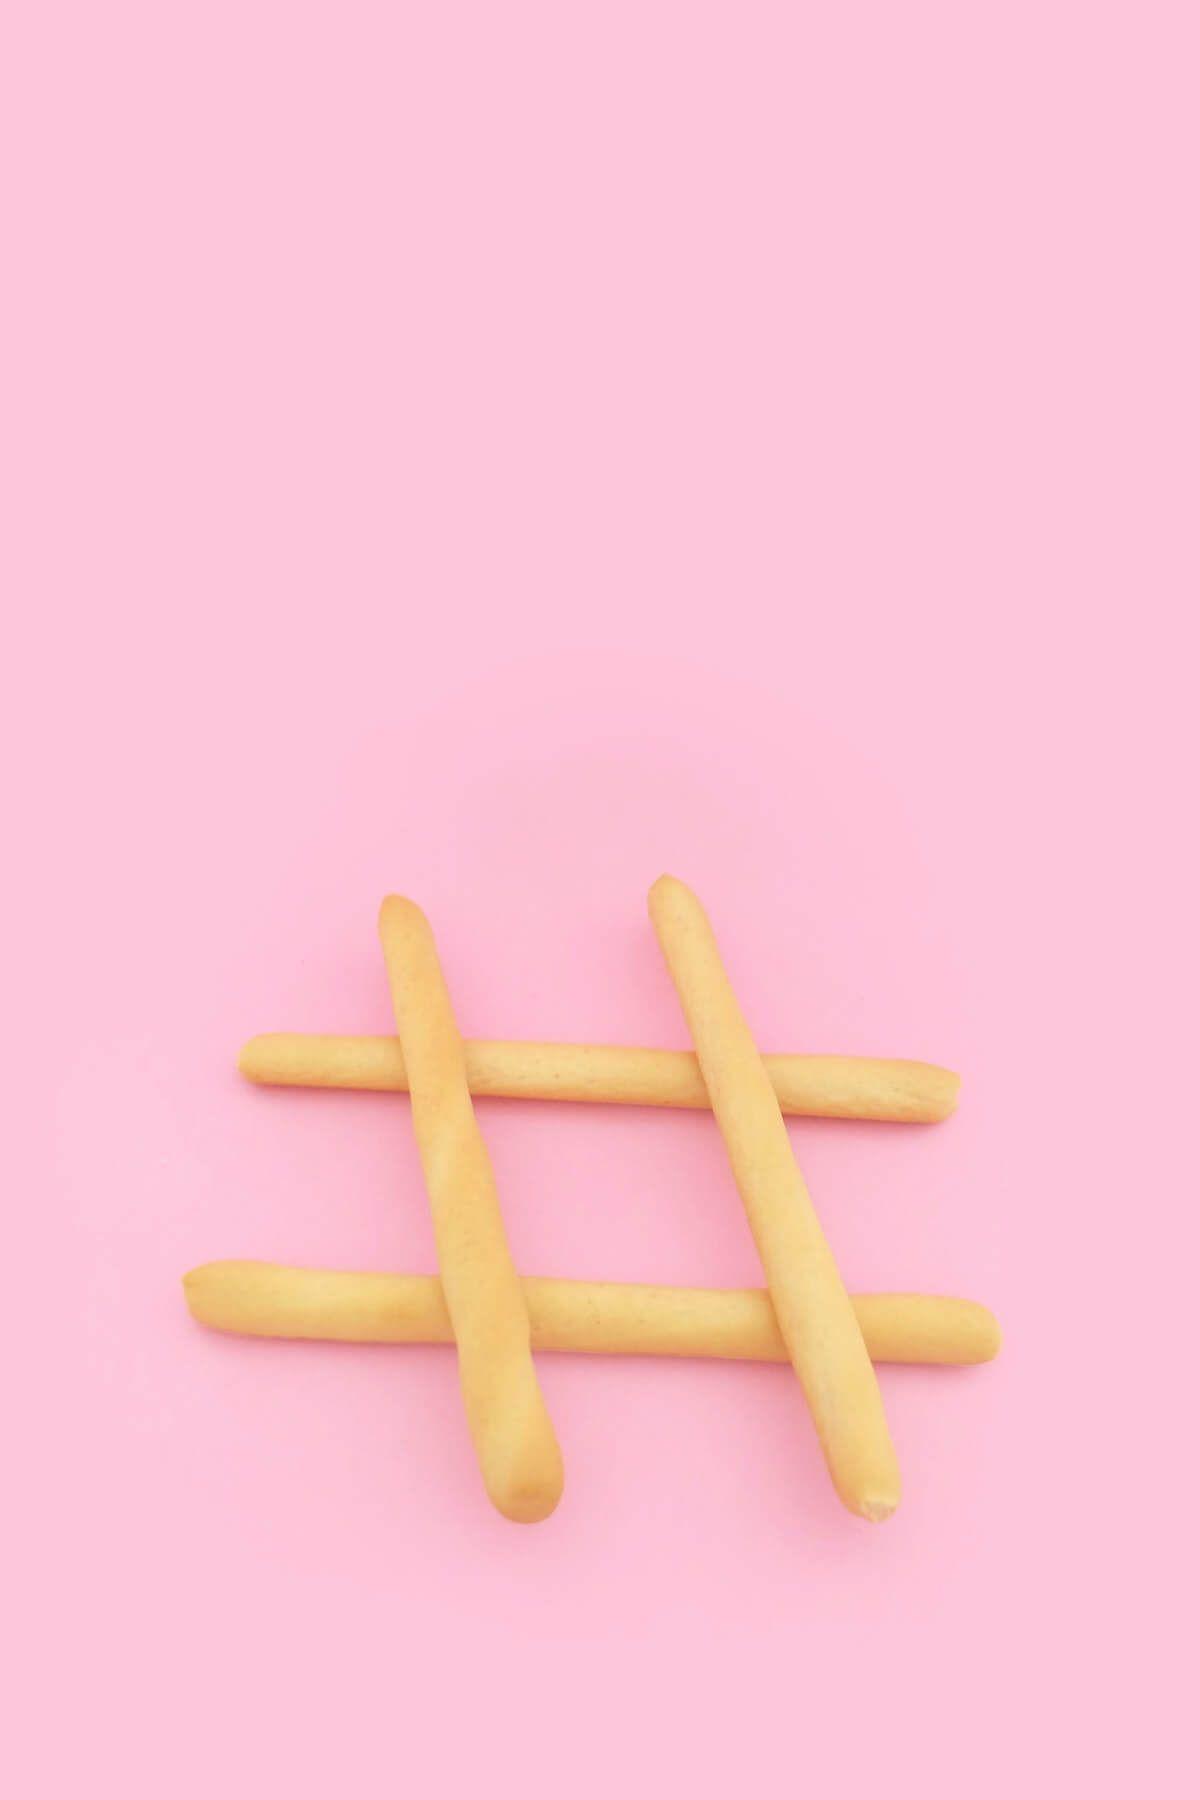 Hashtags, hoe gebruik je ze op de juiste manier?